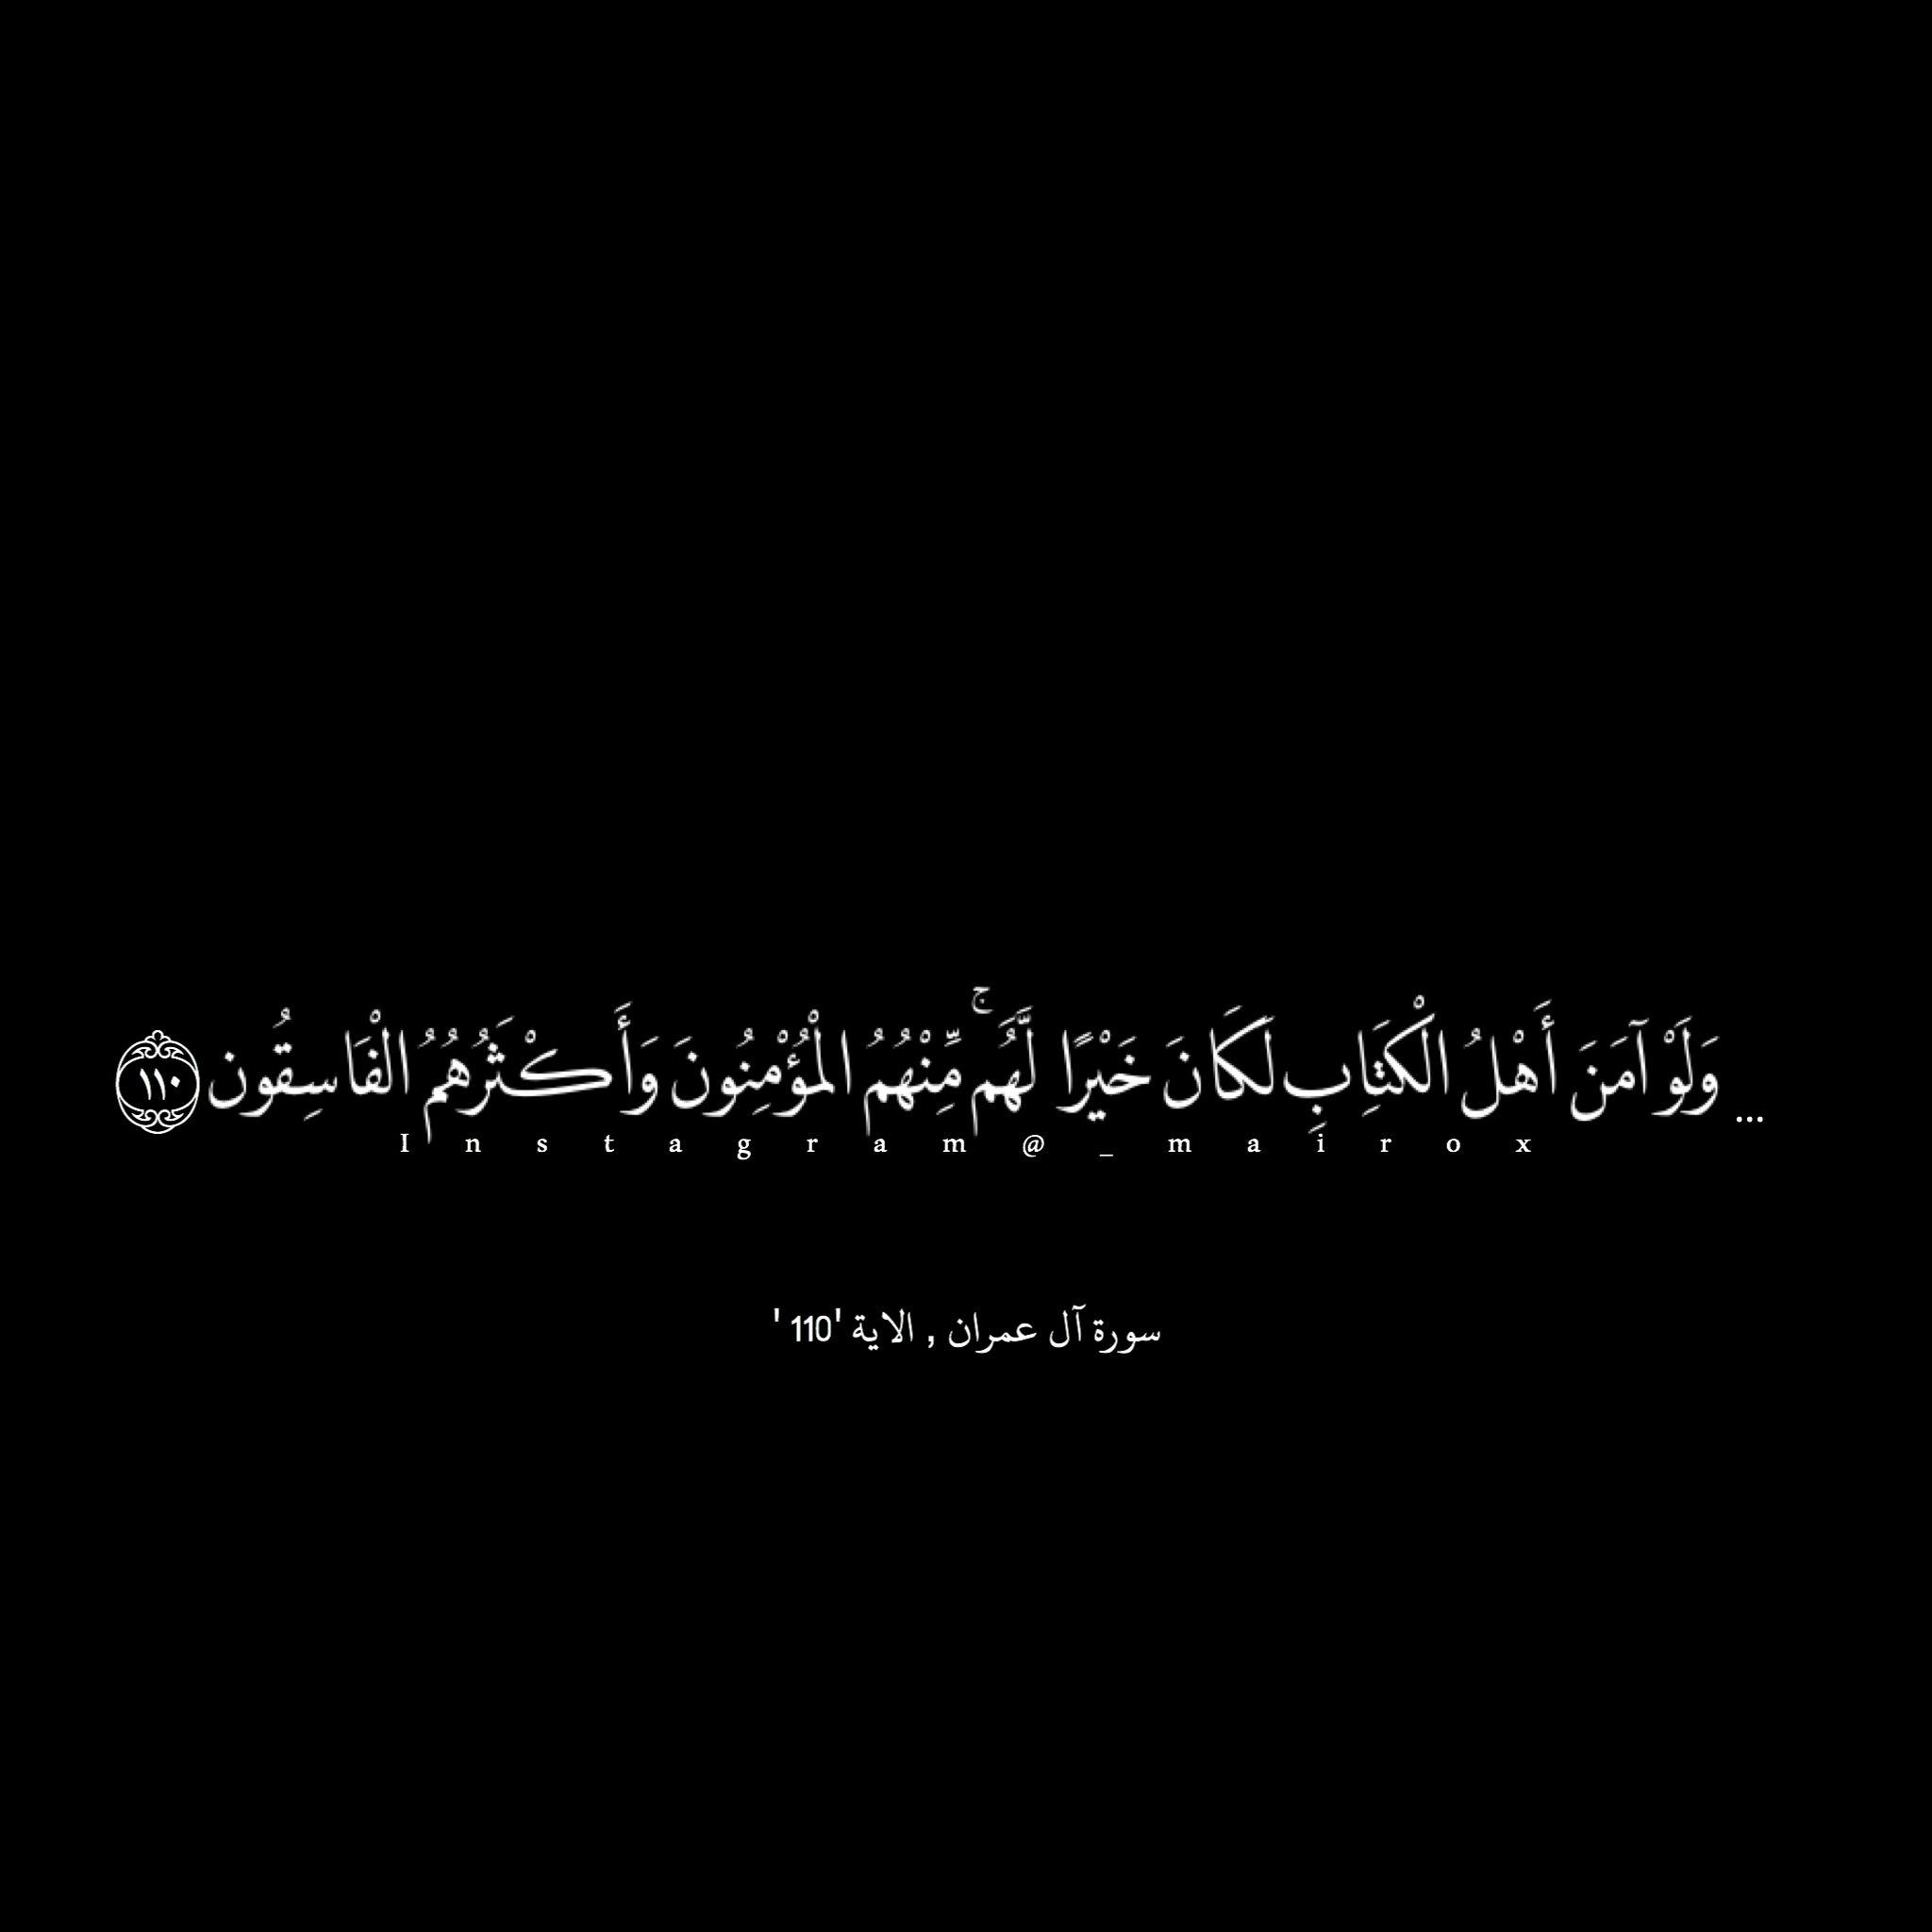 اهل الكتاب قران اقتباسات ابيض اسود Arabic Arabic Calligraphy Aes